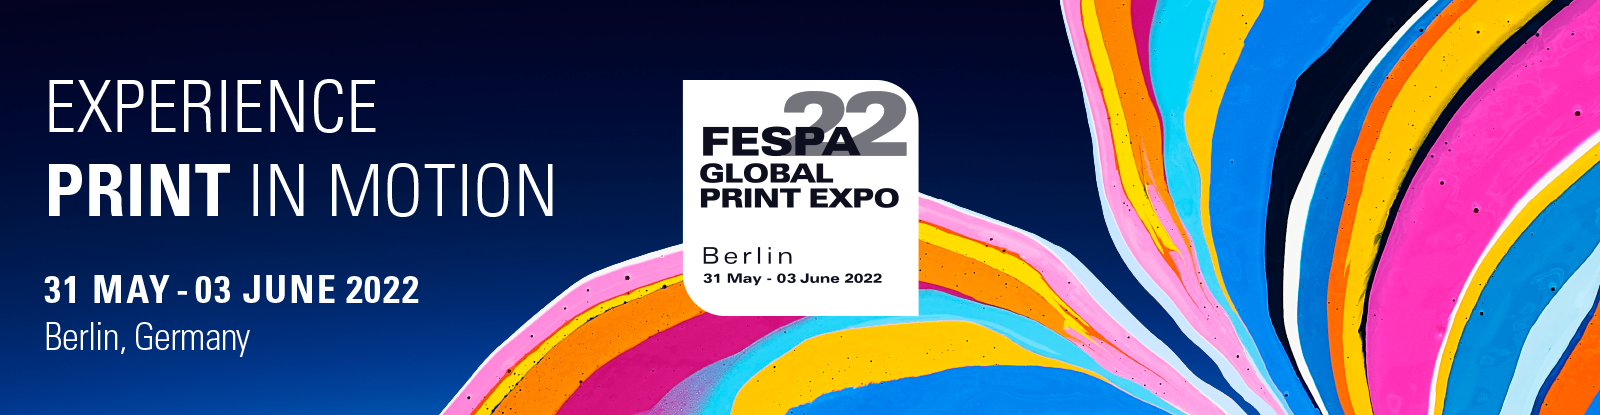 FESPA 2022